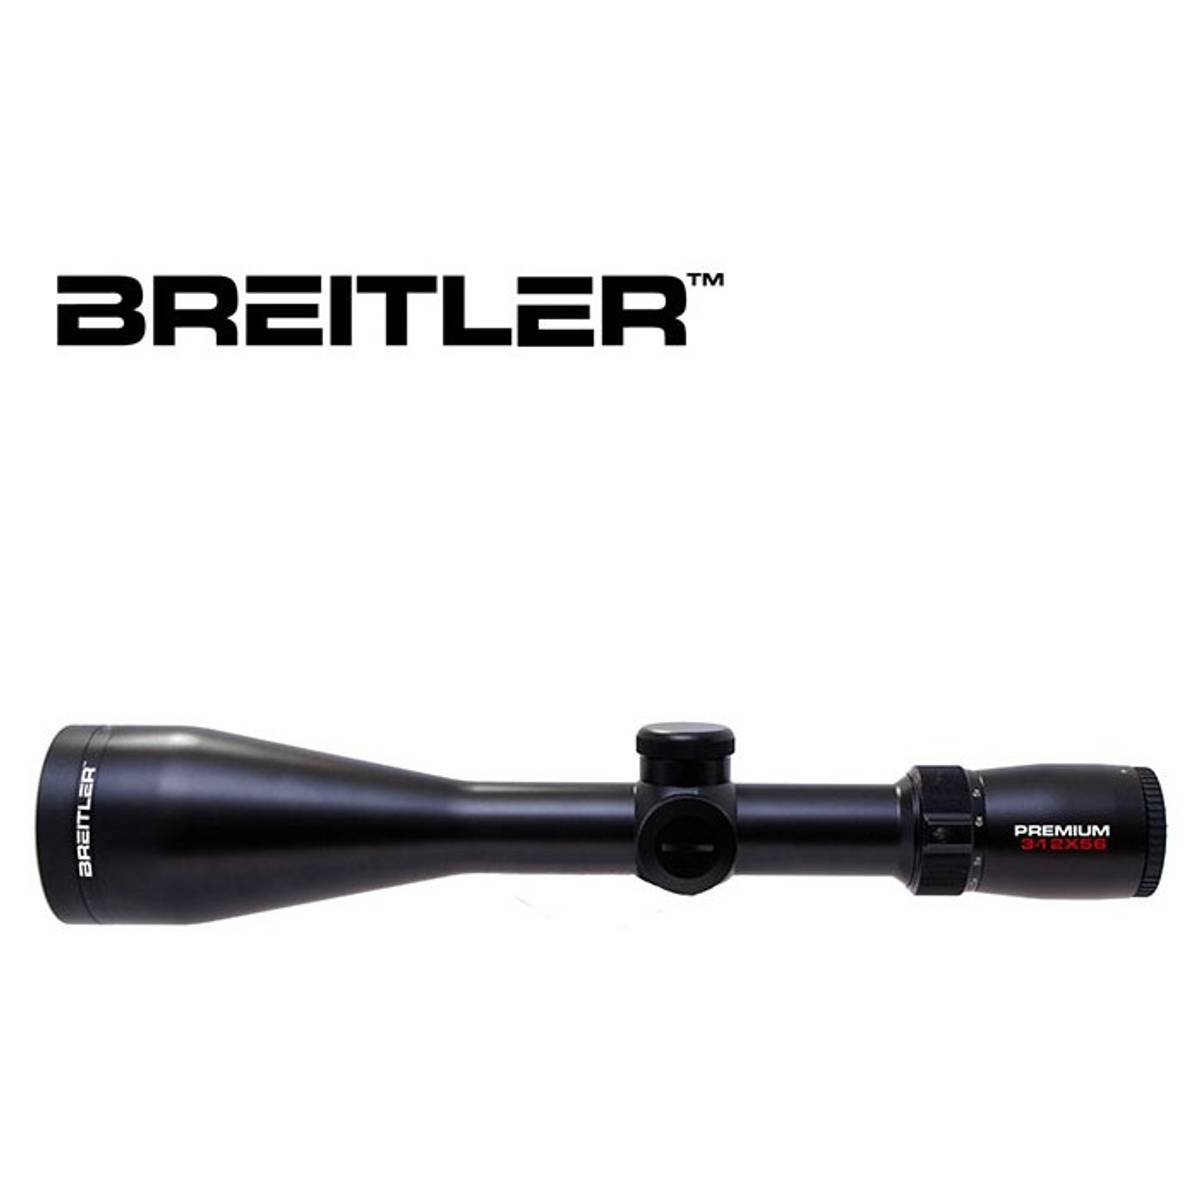 Breitler Premium P 3-12x56 L4 Red Dot